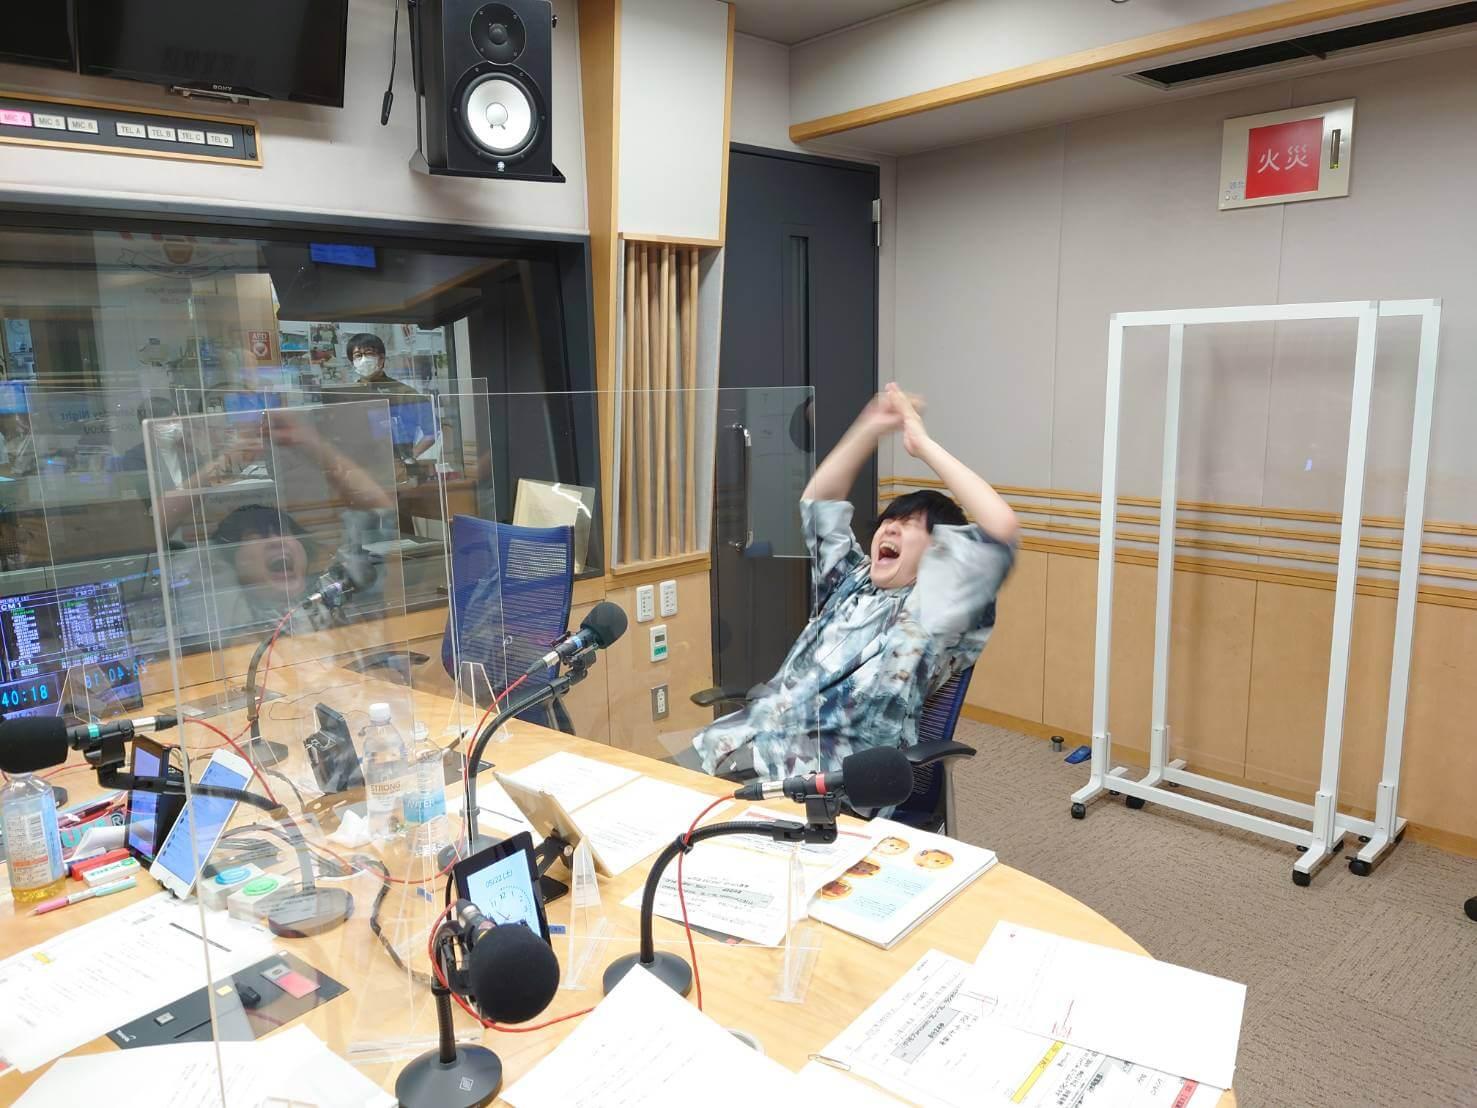 A&G TRIBAL RADIO エジソン! 2021年5月22日 放送後記